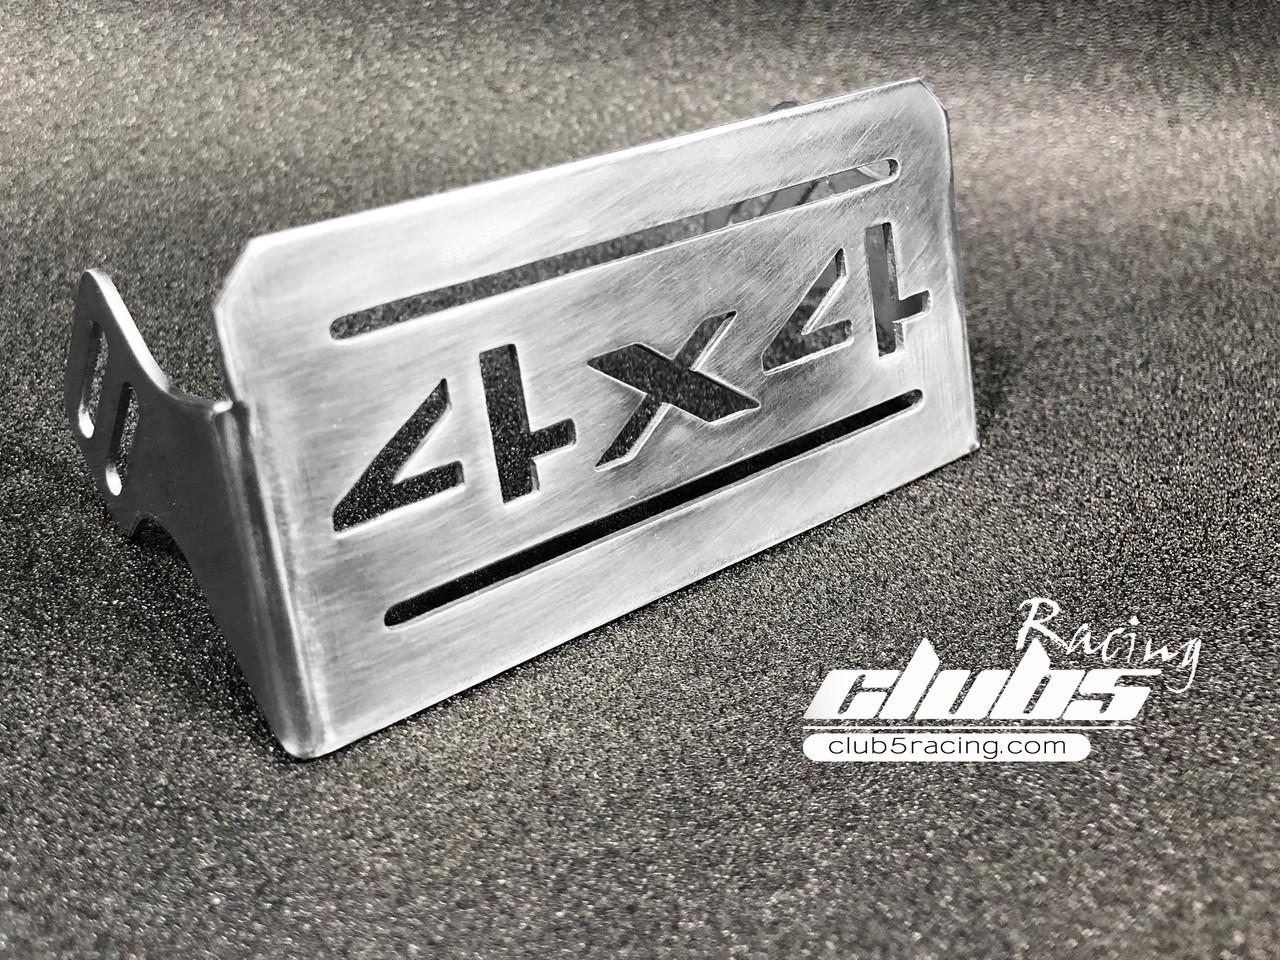 Front Skid Plate / Servo Guard for Traxxas TRX-4 Defender D110